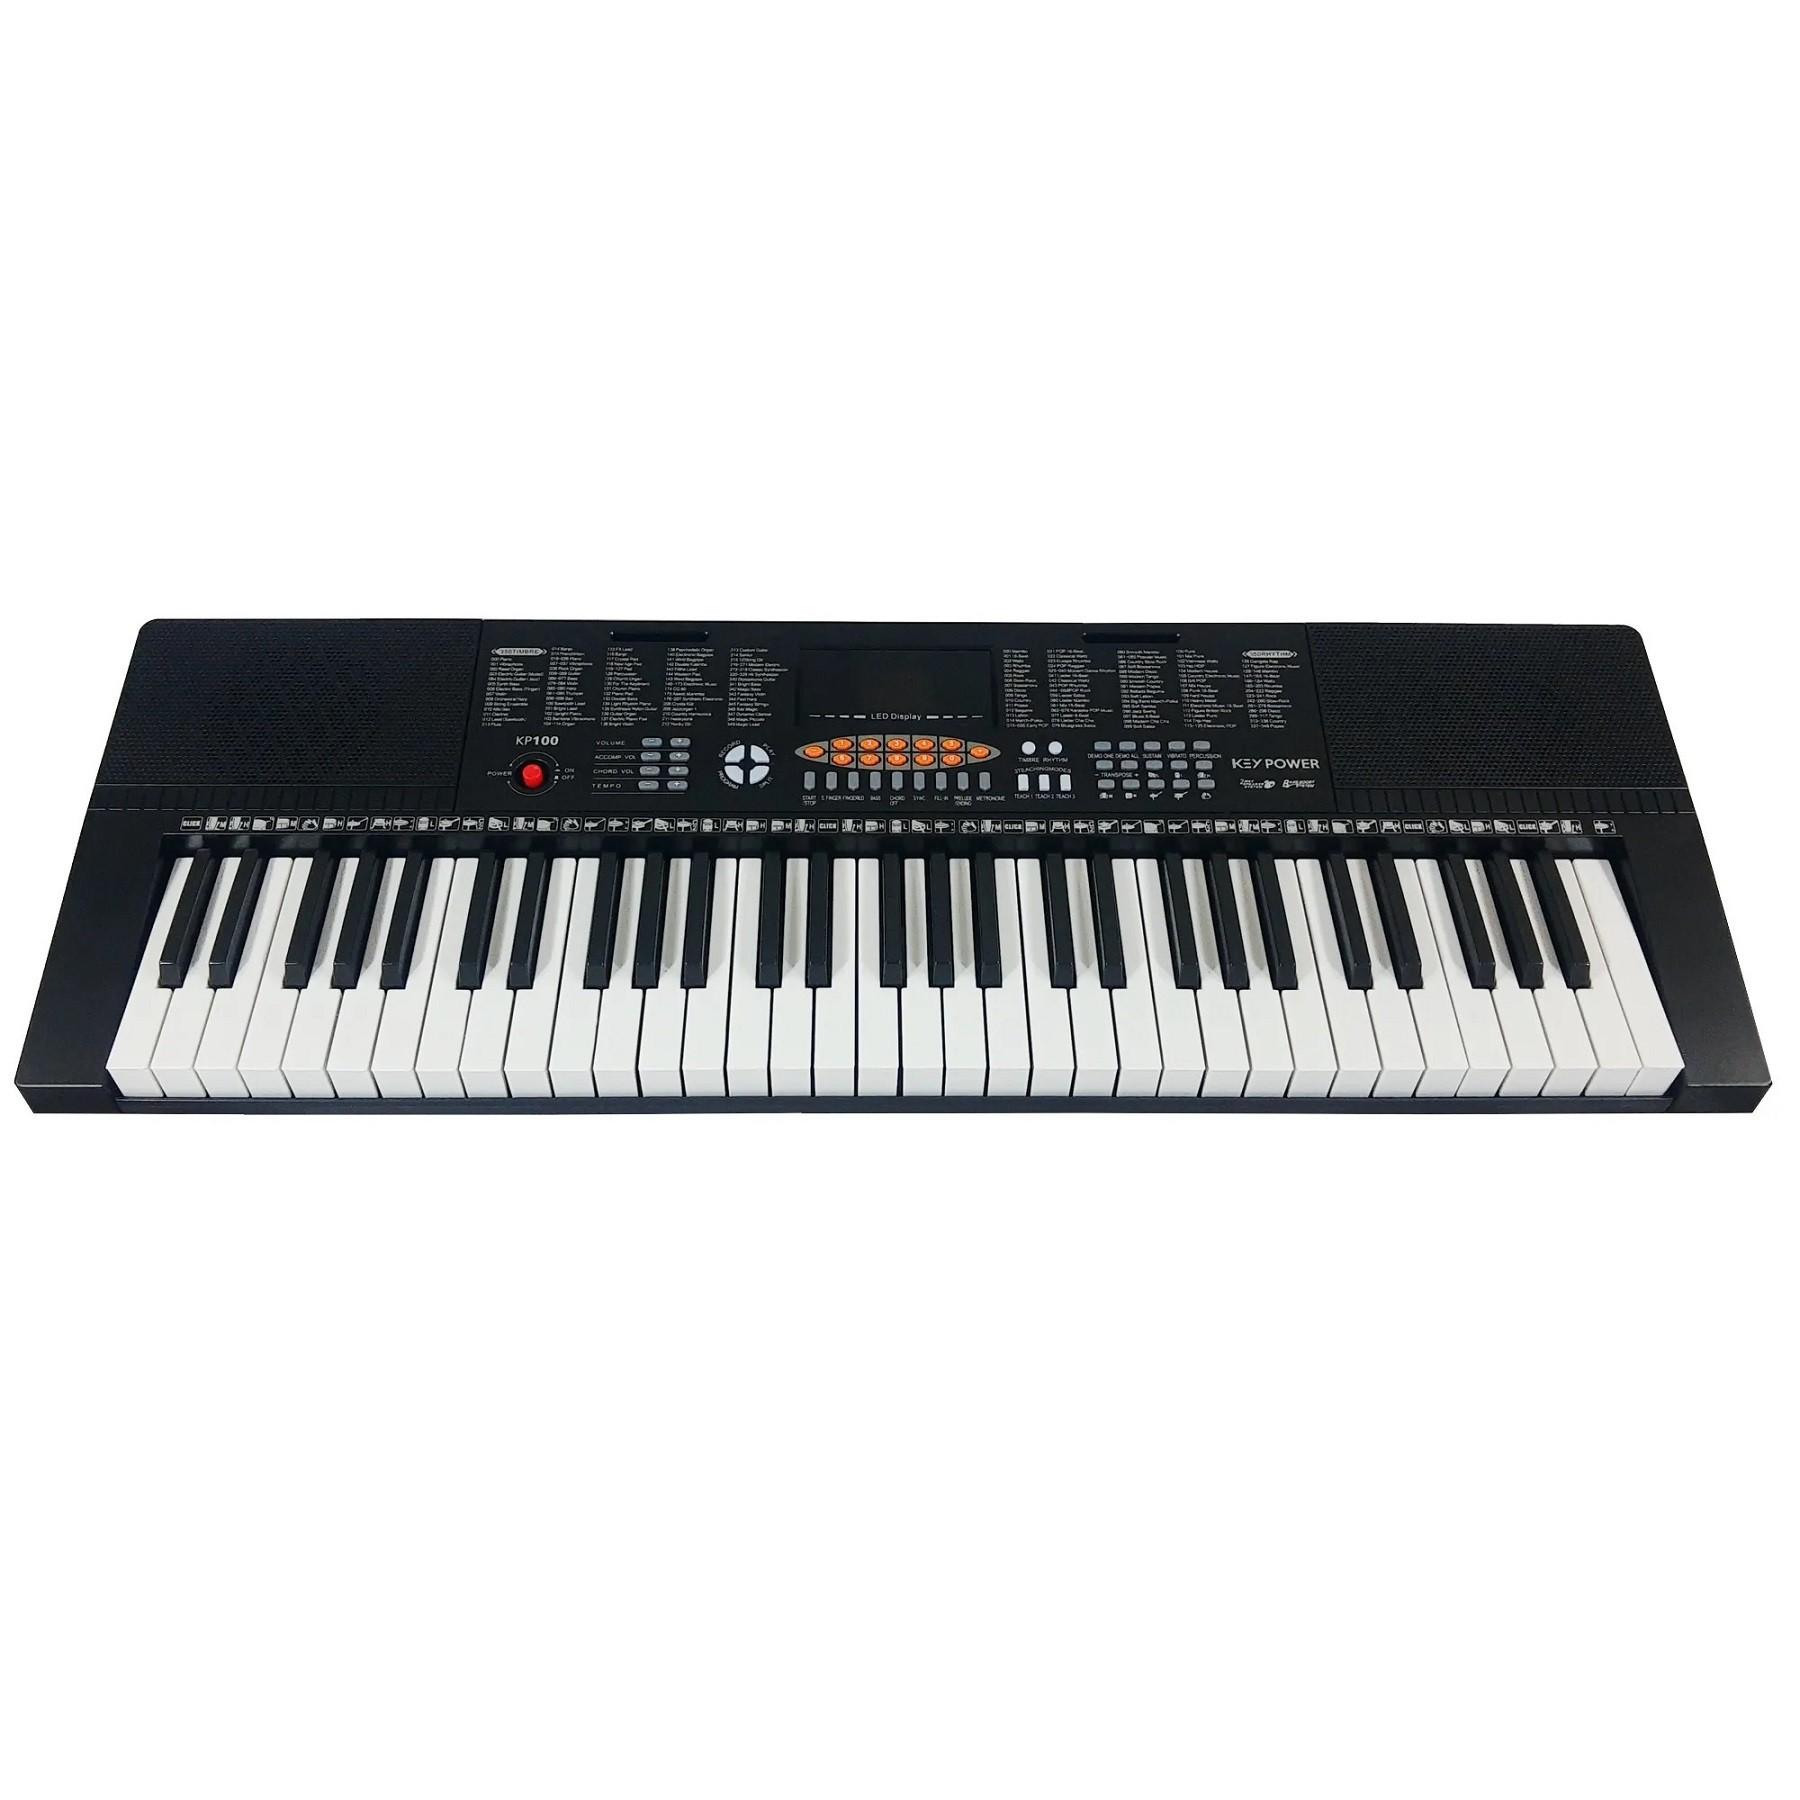 Teclado Musical 5/8 Estudante Kadosh Keypower Kp100